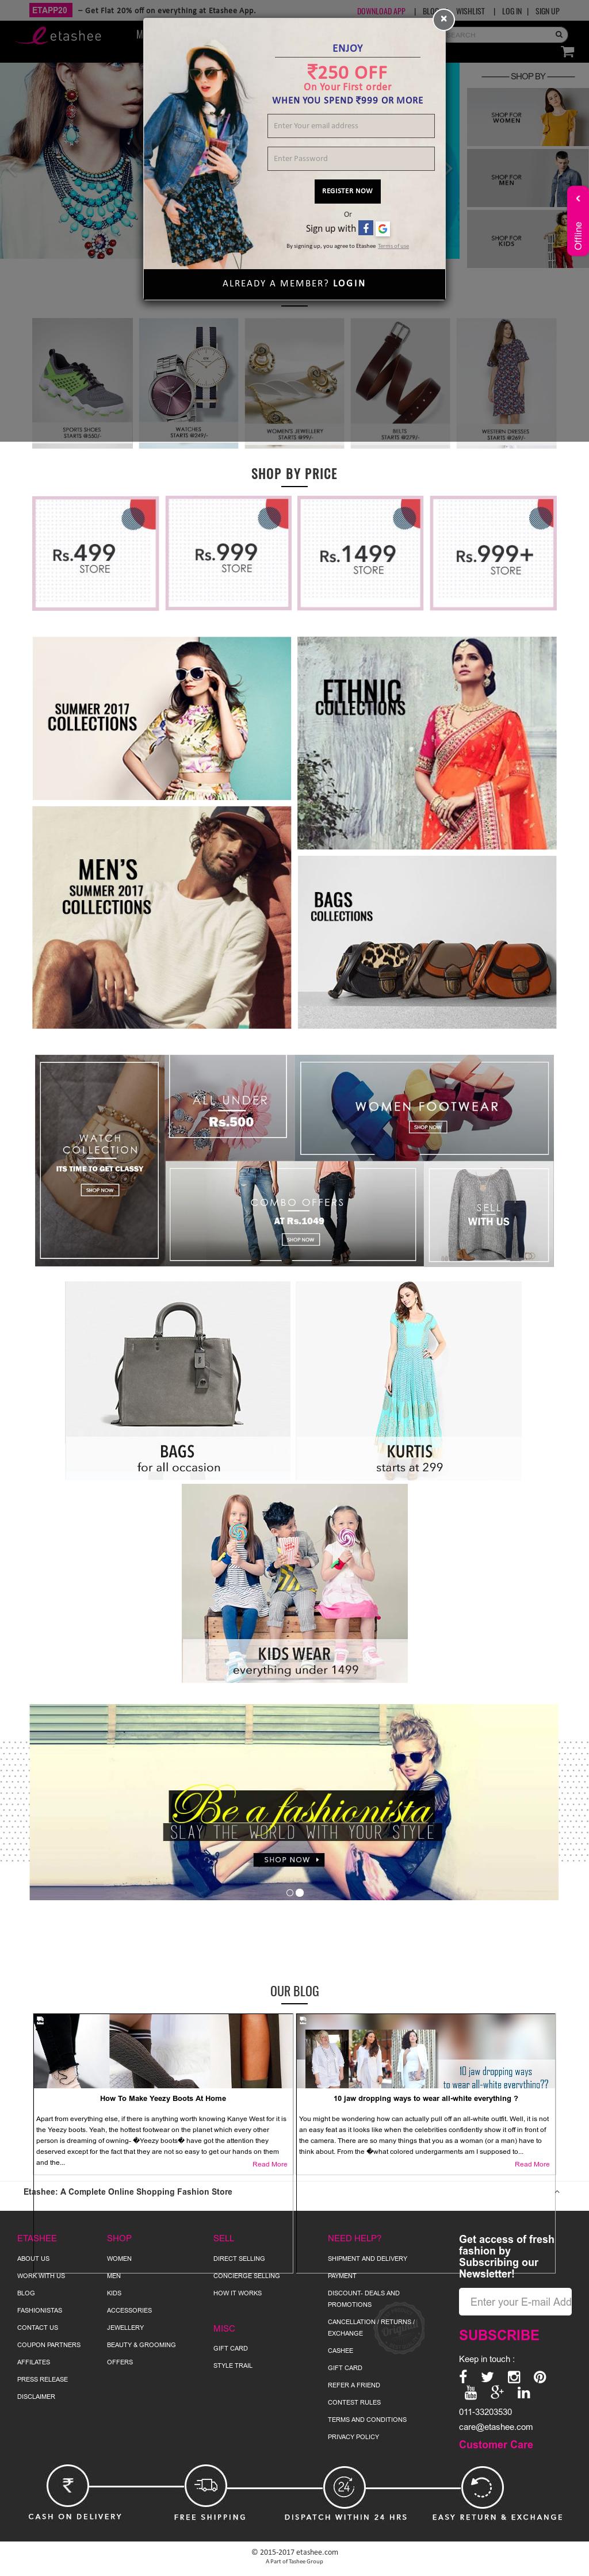 f813610dad Etashee Competitors, Revenue and Employees - Owler Company Profile